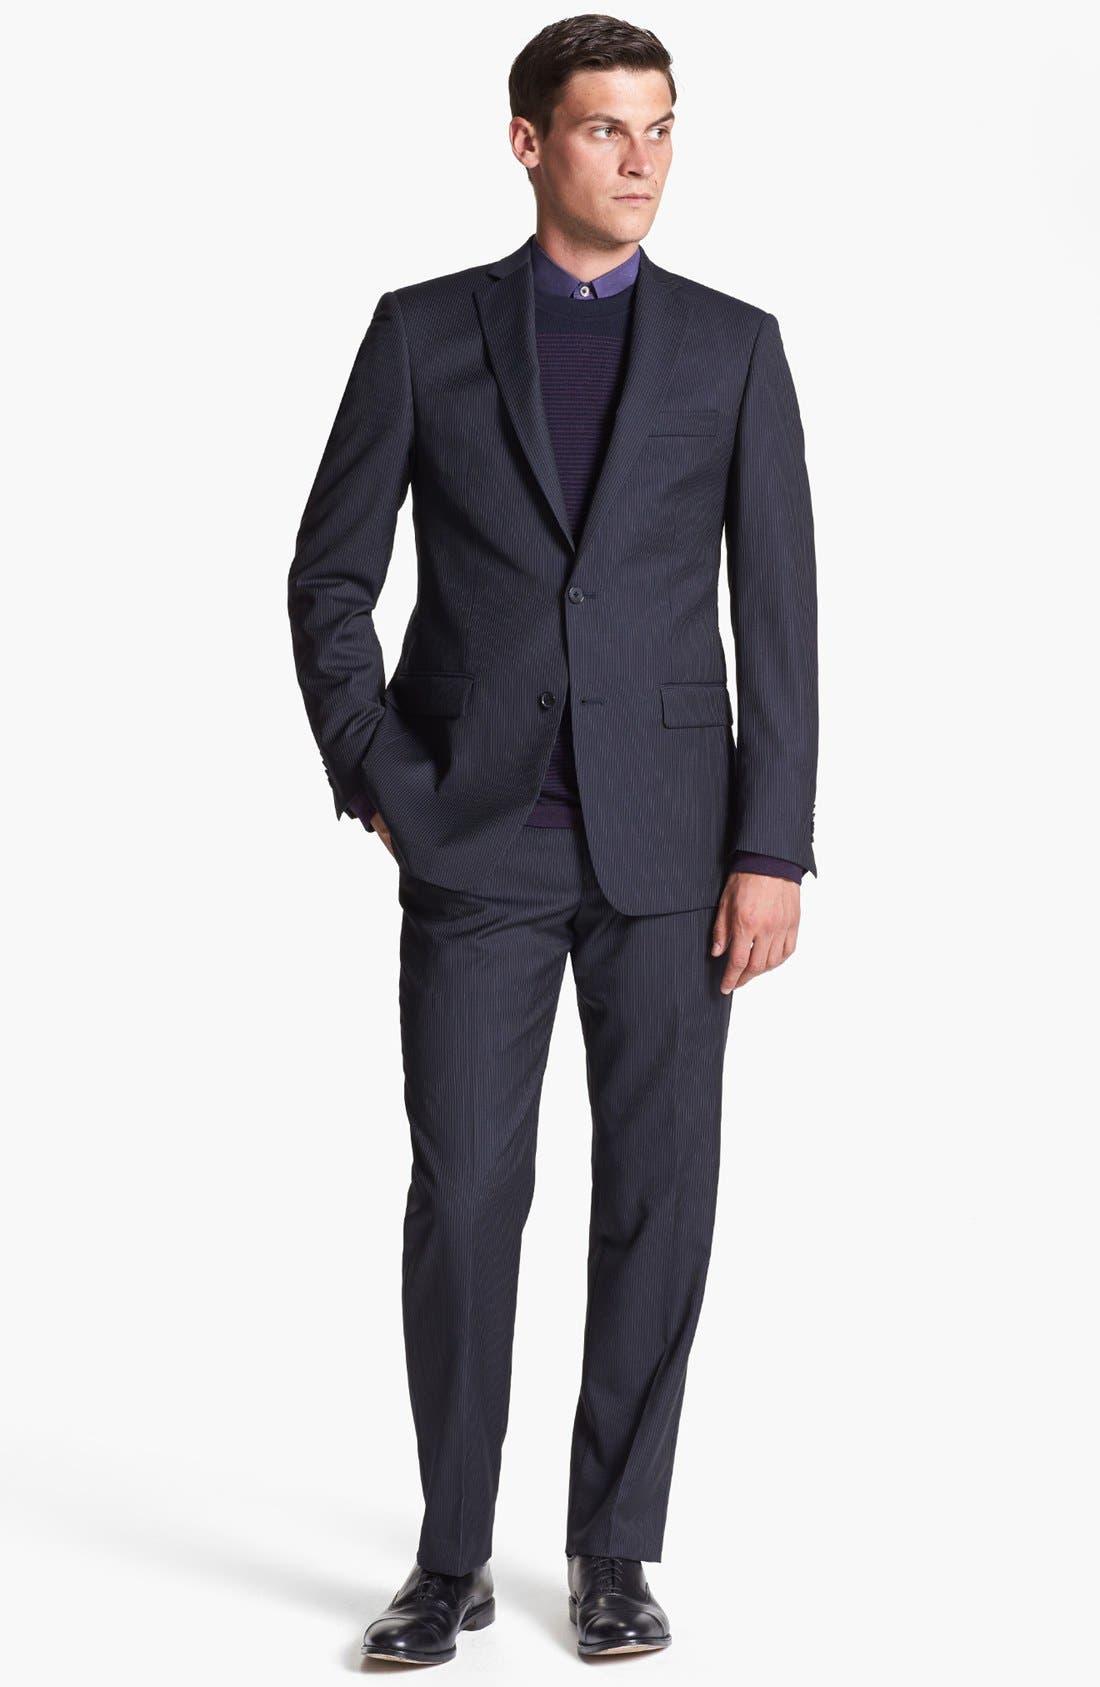 Alternate Image 1 Selected - Michael Kors Stripe Suit & Ted Baker London Sweater